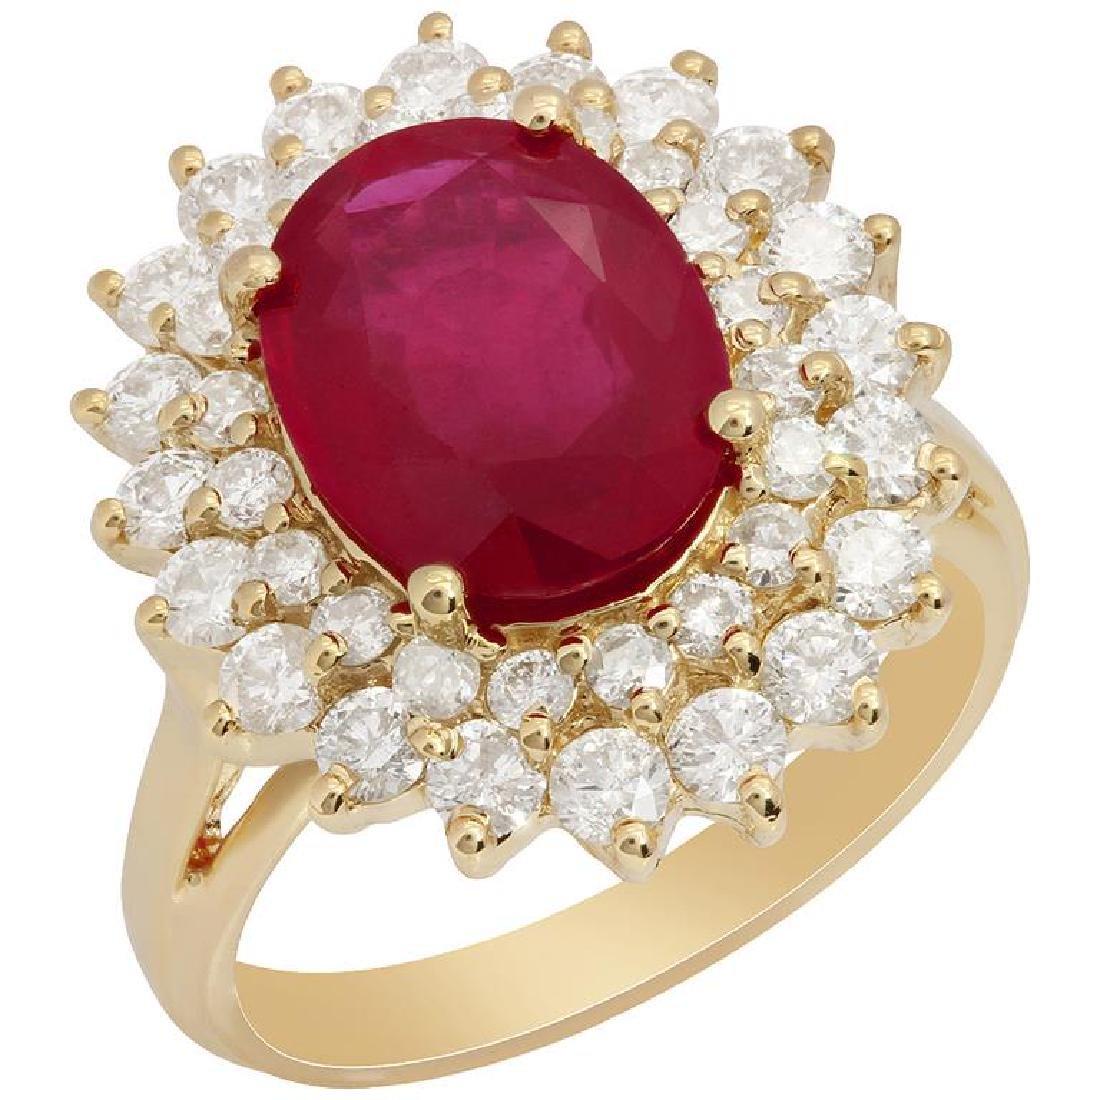 14k Yellow Gold 3.77ct Ruby 1.56ct Diamond Ring